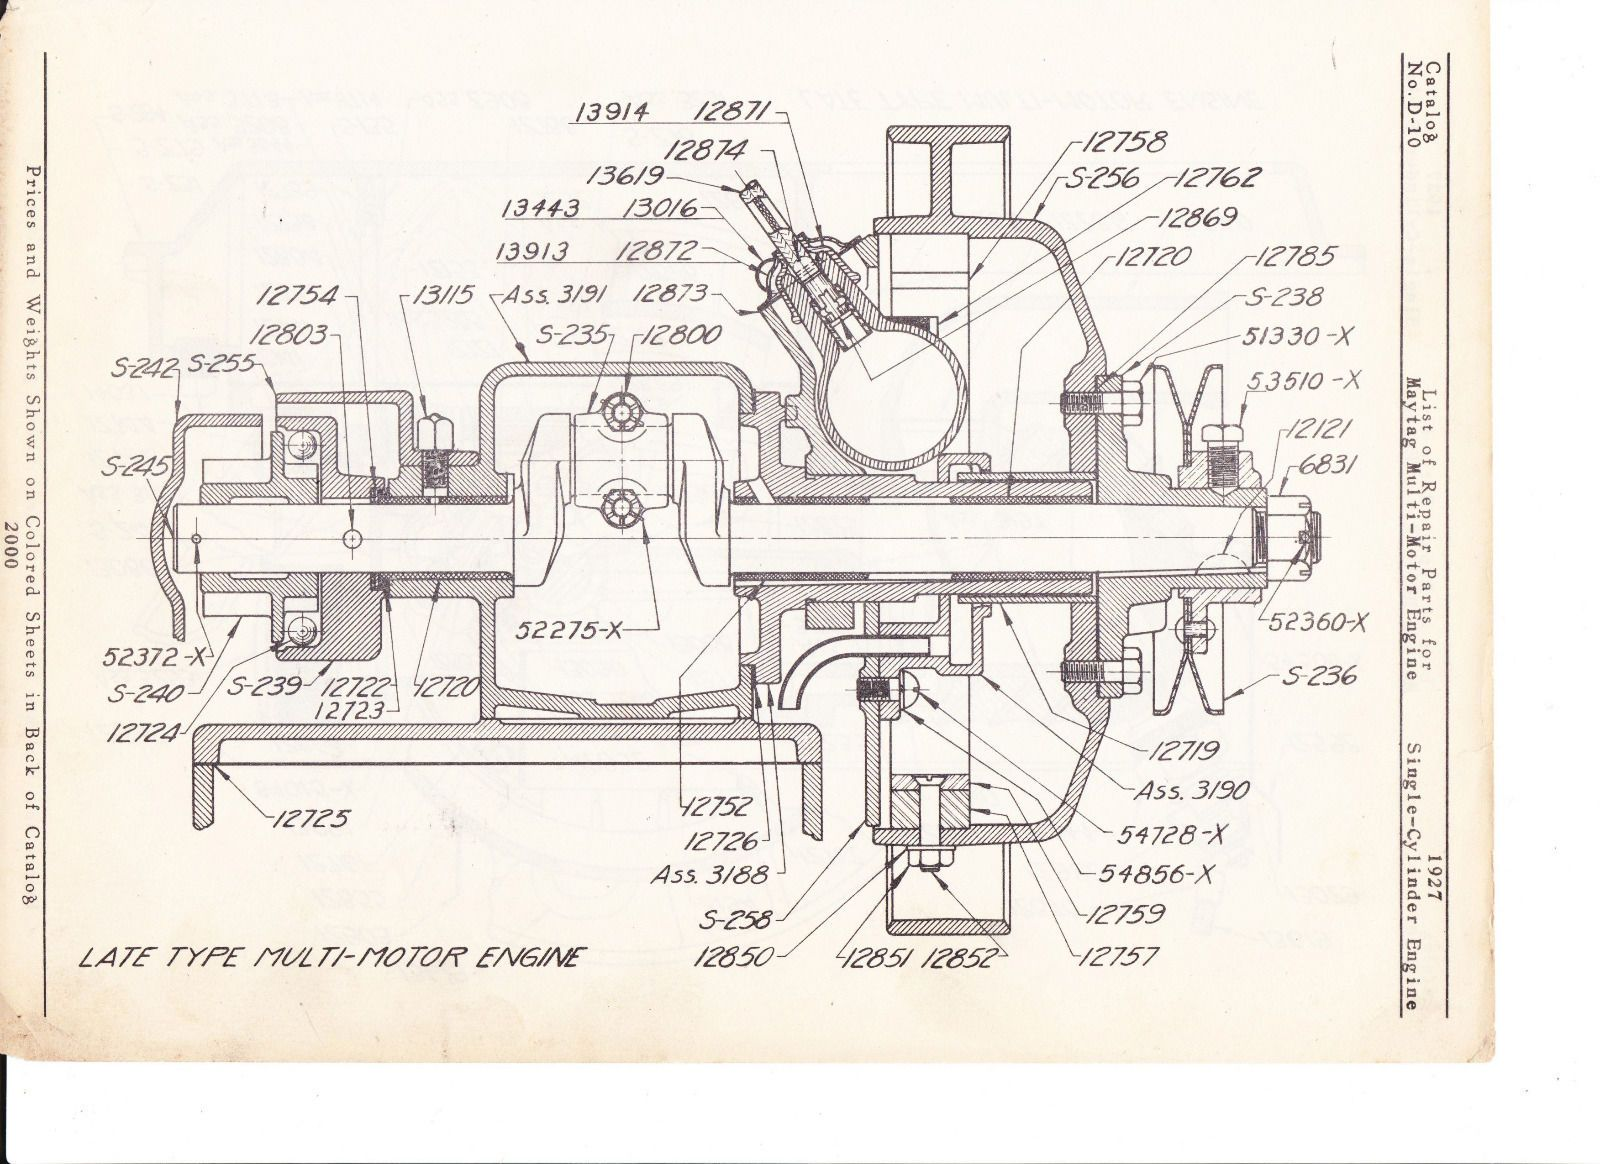 maytag gas motor diagram of 1927 model 92 hit miss ebay [ 1600 x 1164 Pixel ]